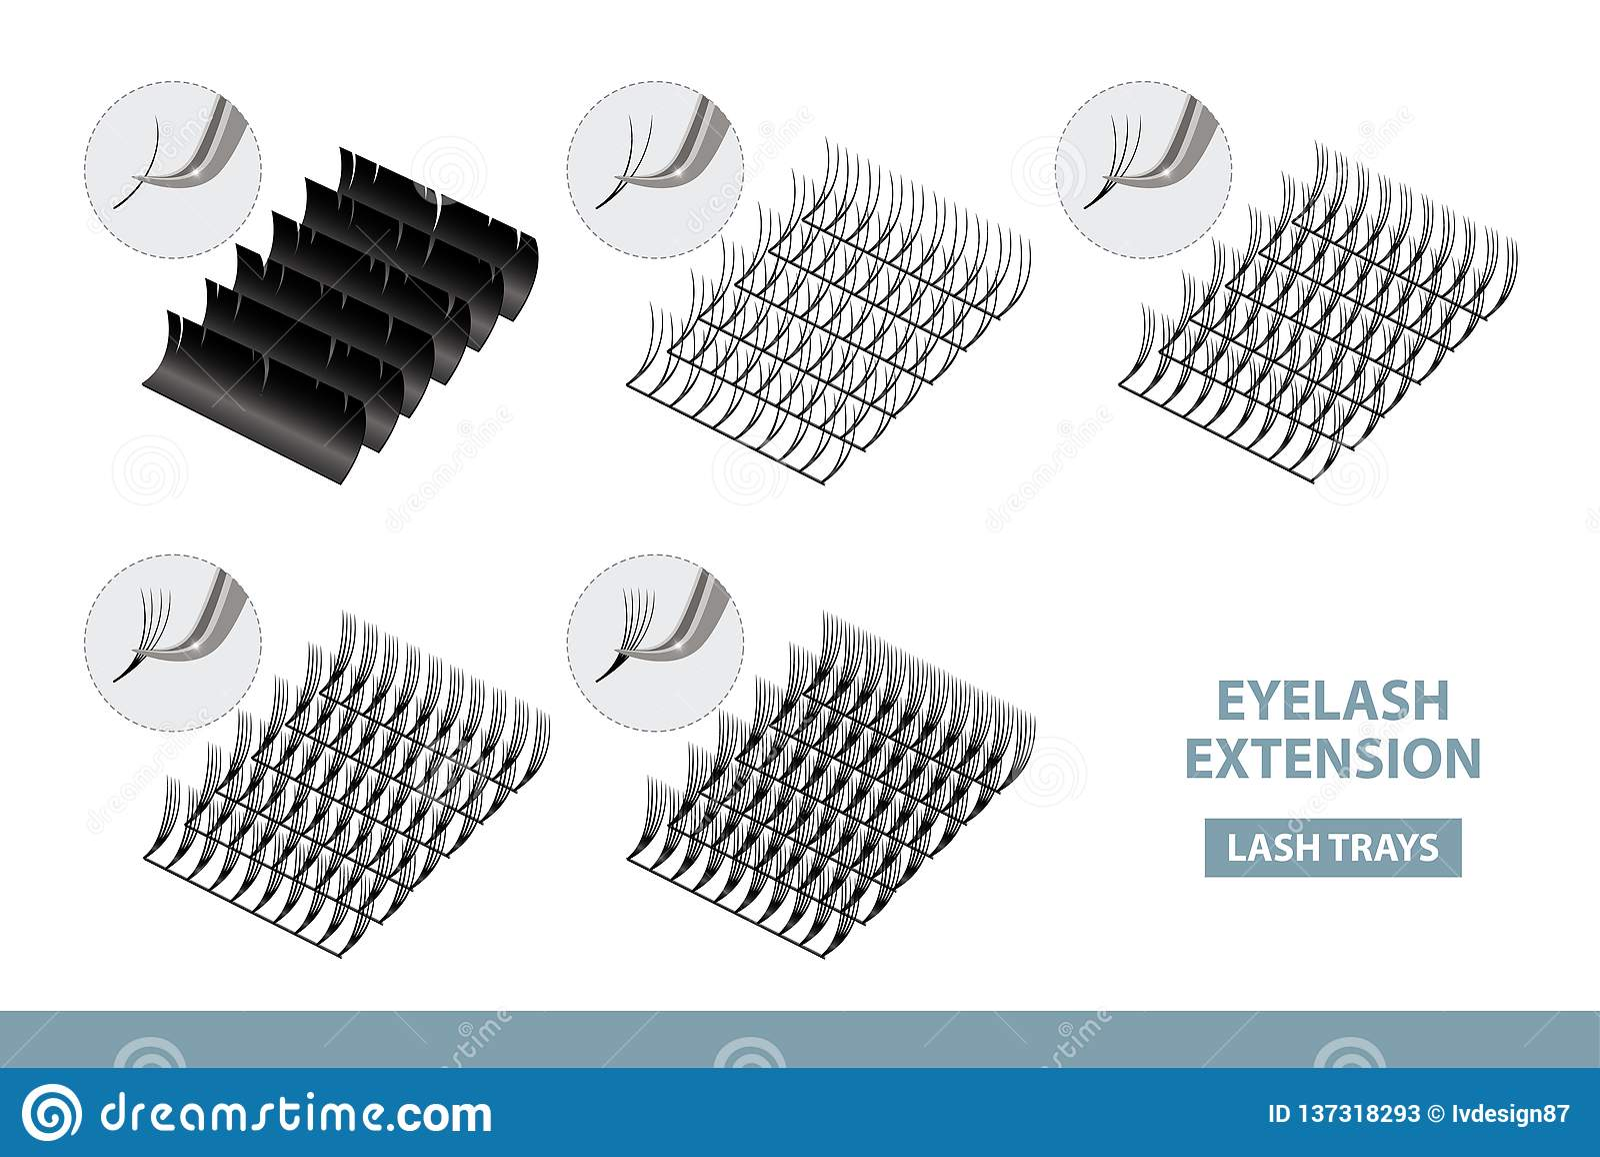 Eyelash Extension Application Tools And Supplies  Volume